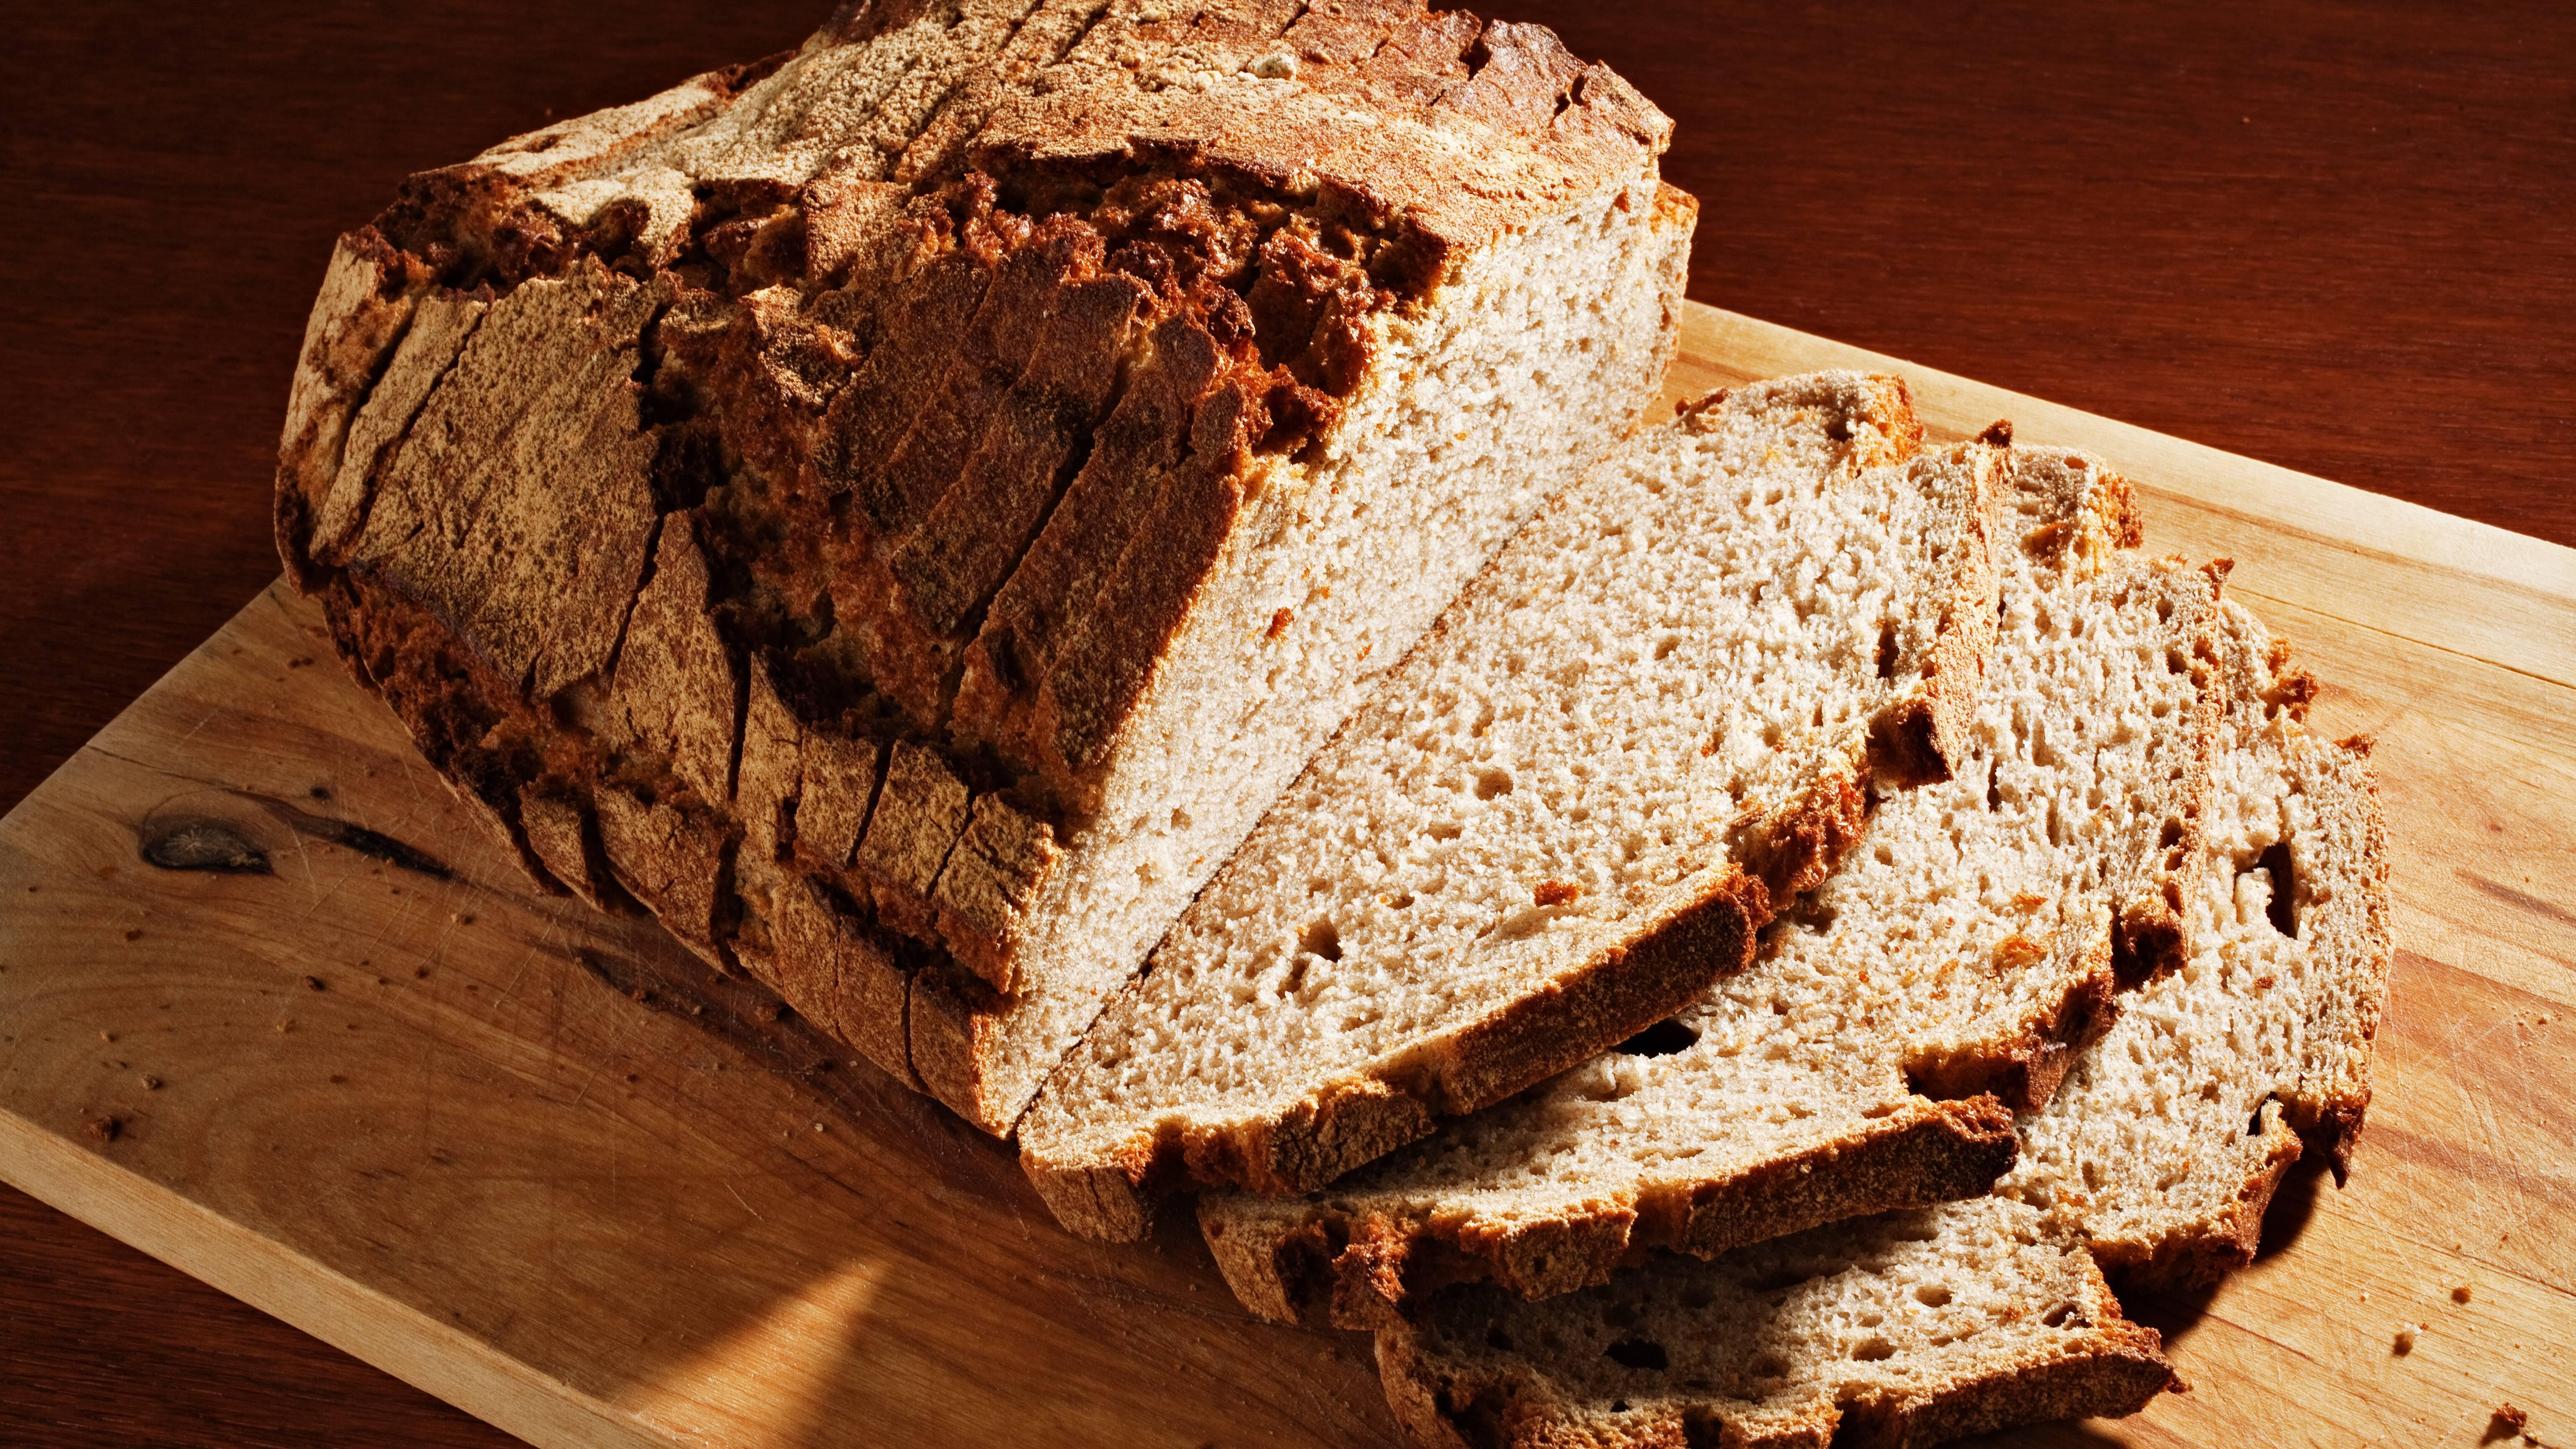 Glutenfreies Brot kann leicht selbst gemacht werden.